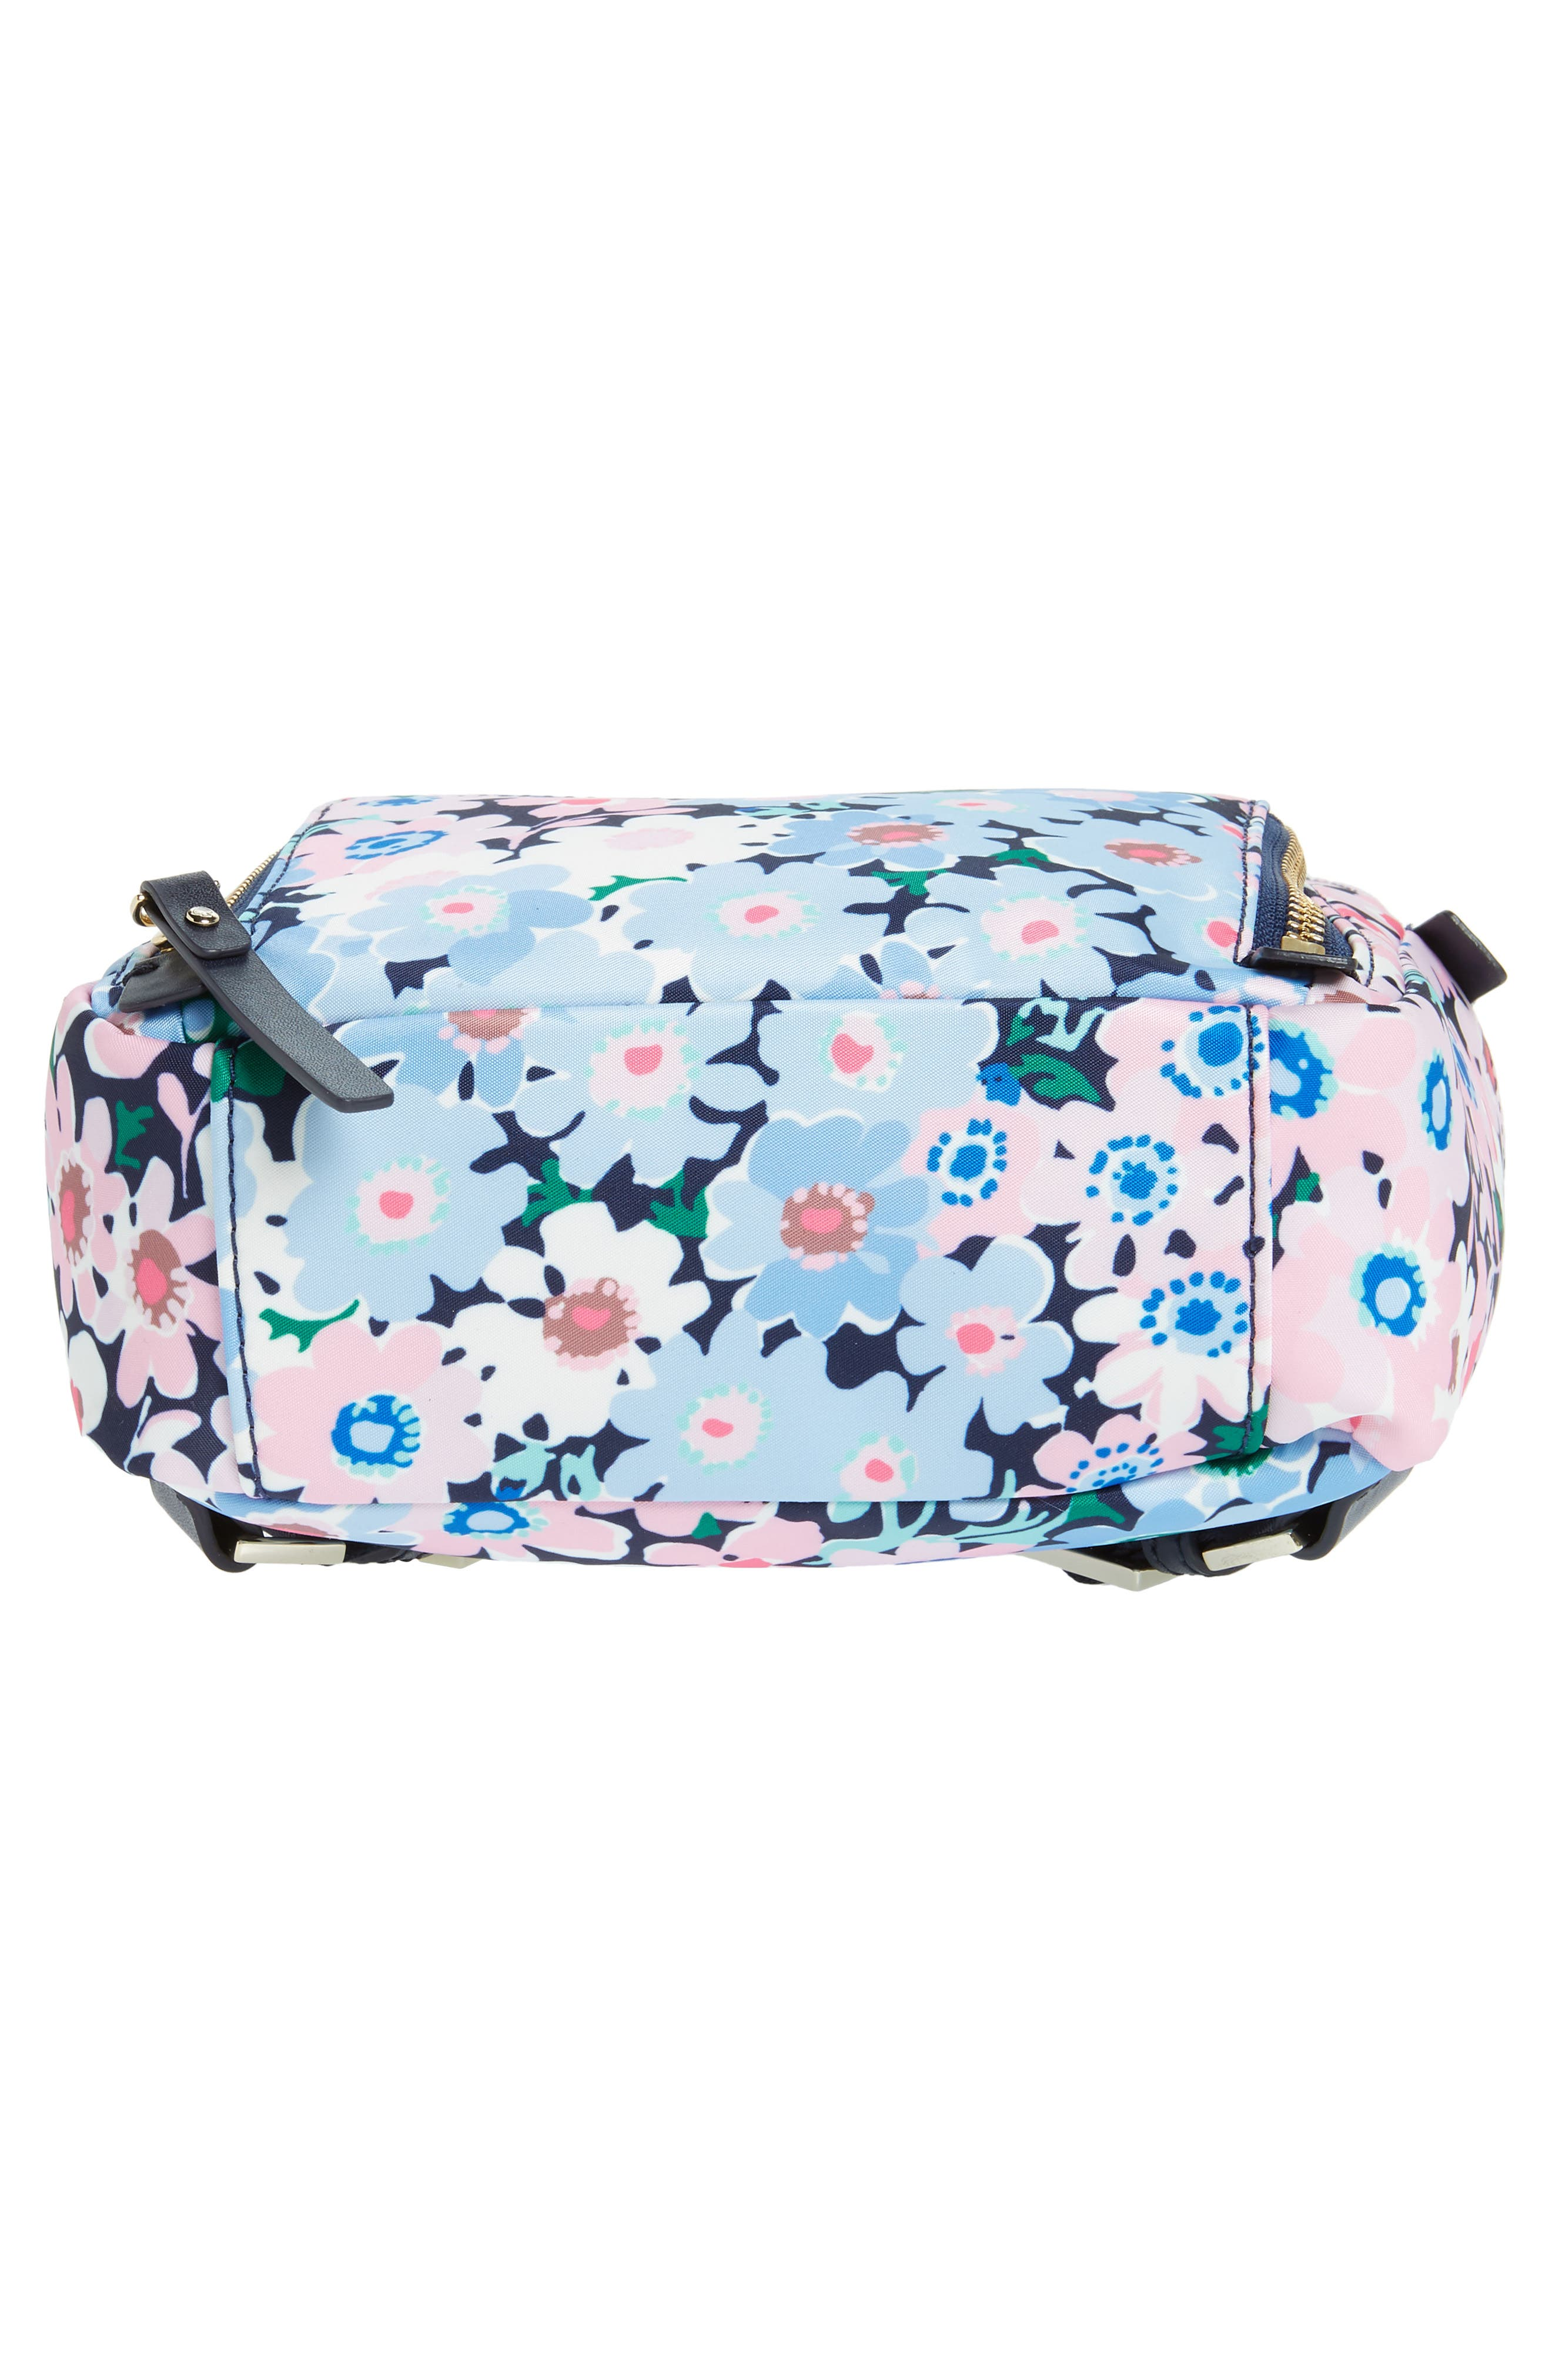 watson lane - daisy garden small hartley backpack,                             Alternate thumbnail 6, color,                             Blue Multi